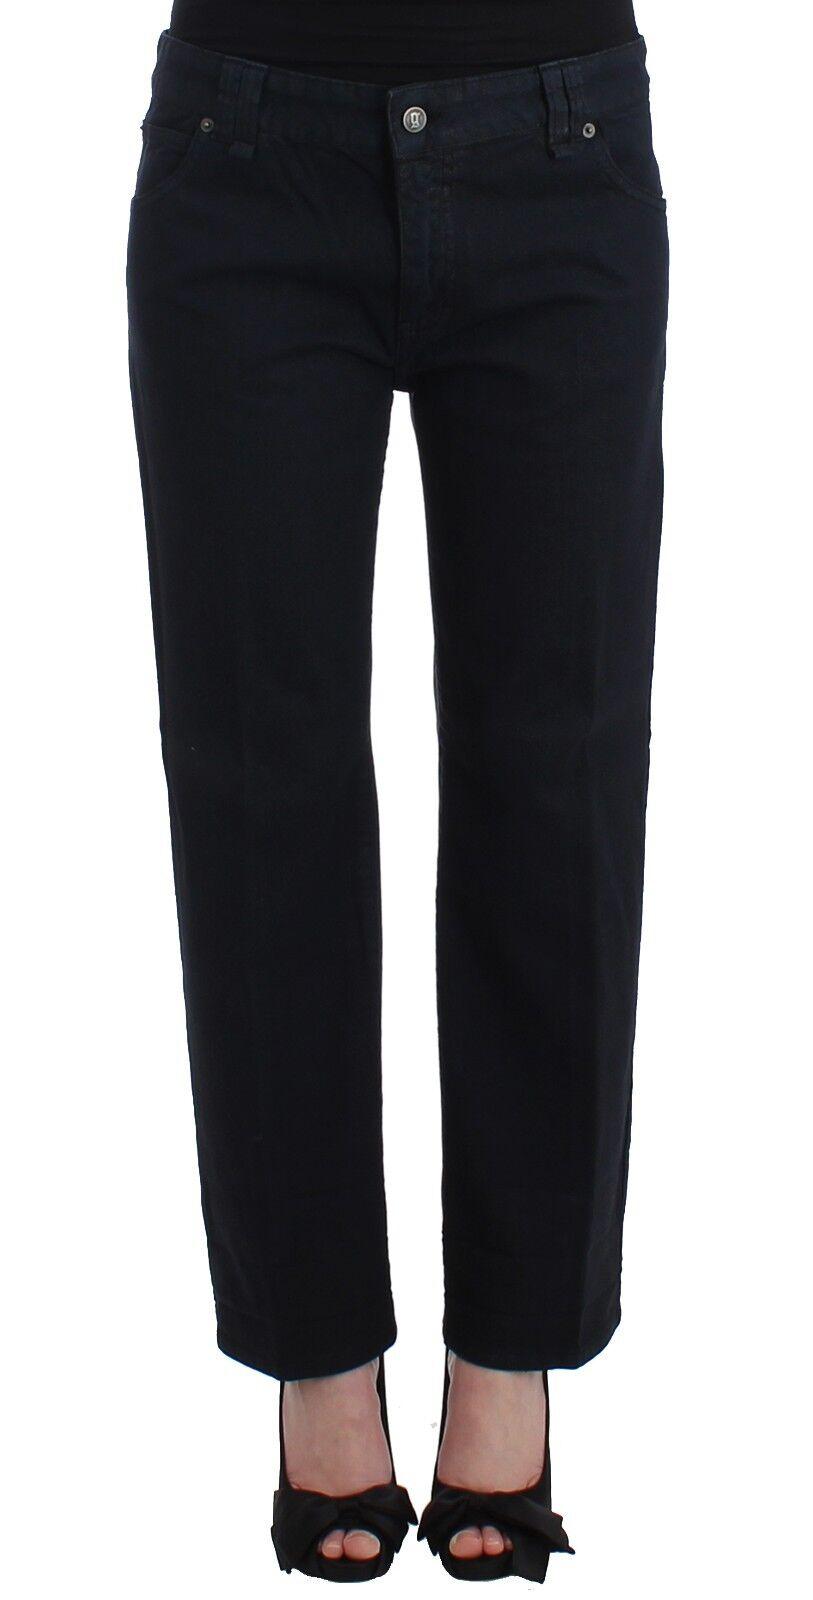 NEW  300 JOHN GALLIANO Pants bluee Cropped Wide Leg Jeans Cargo Loose Fit W32